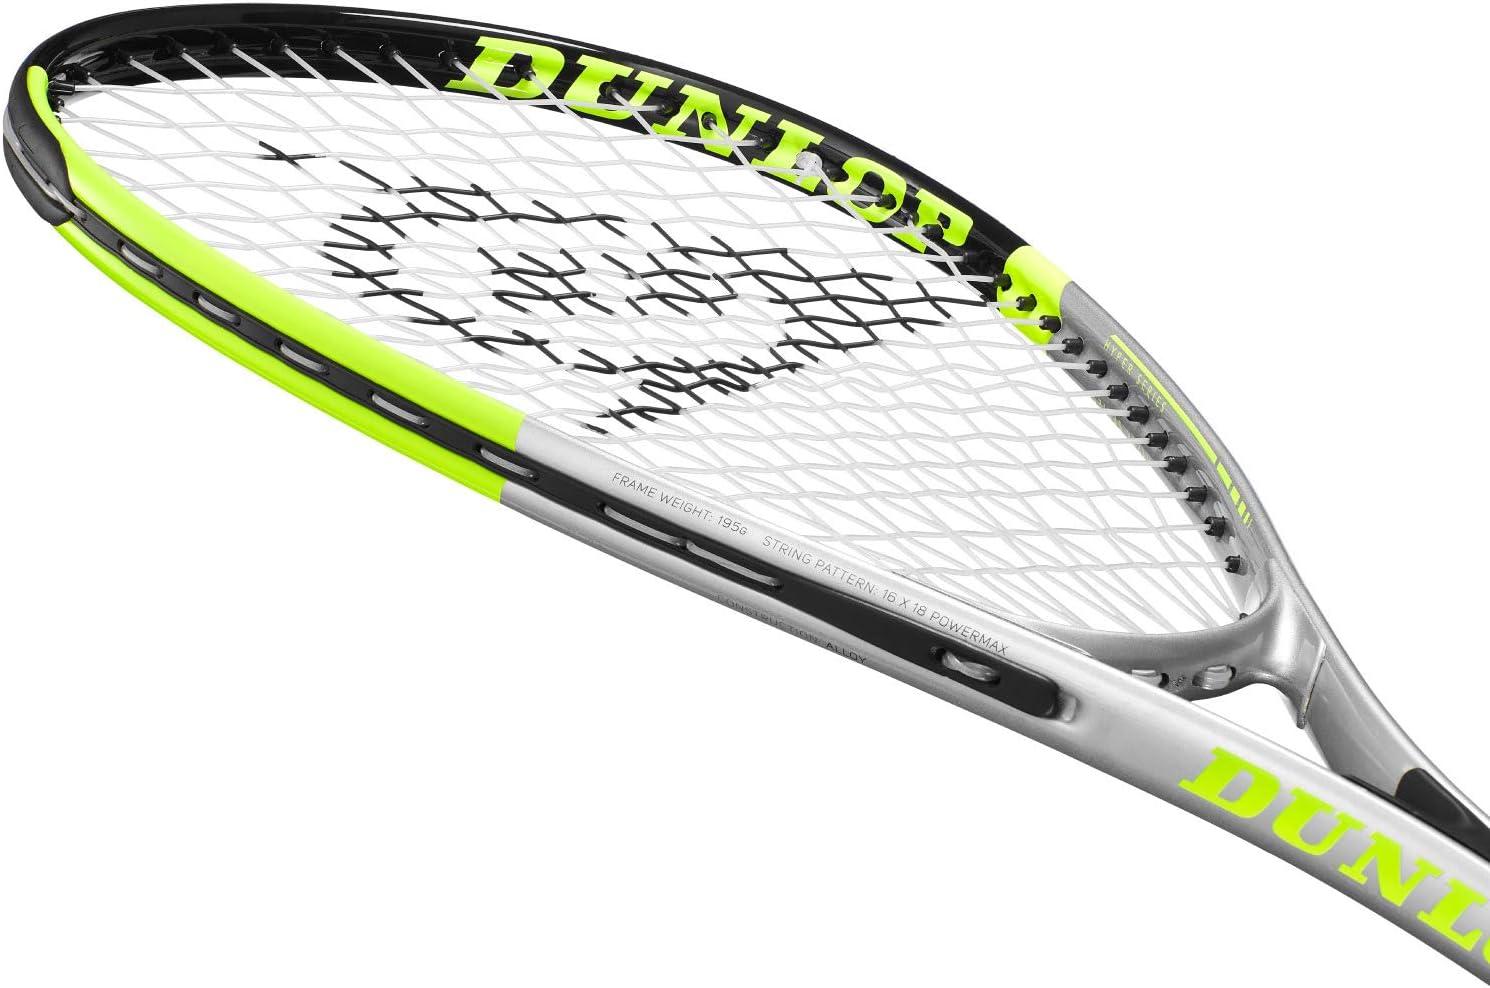 Dunlop Hyper Ti Squash Racket Series